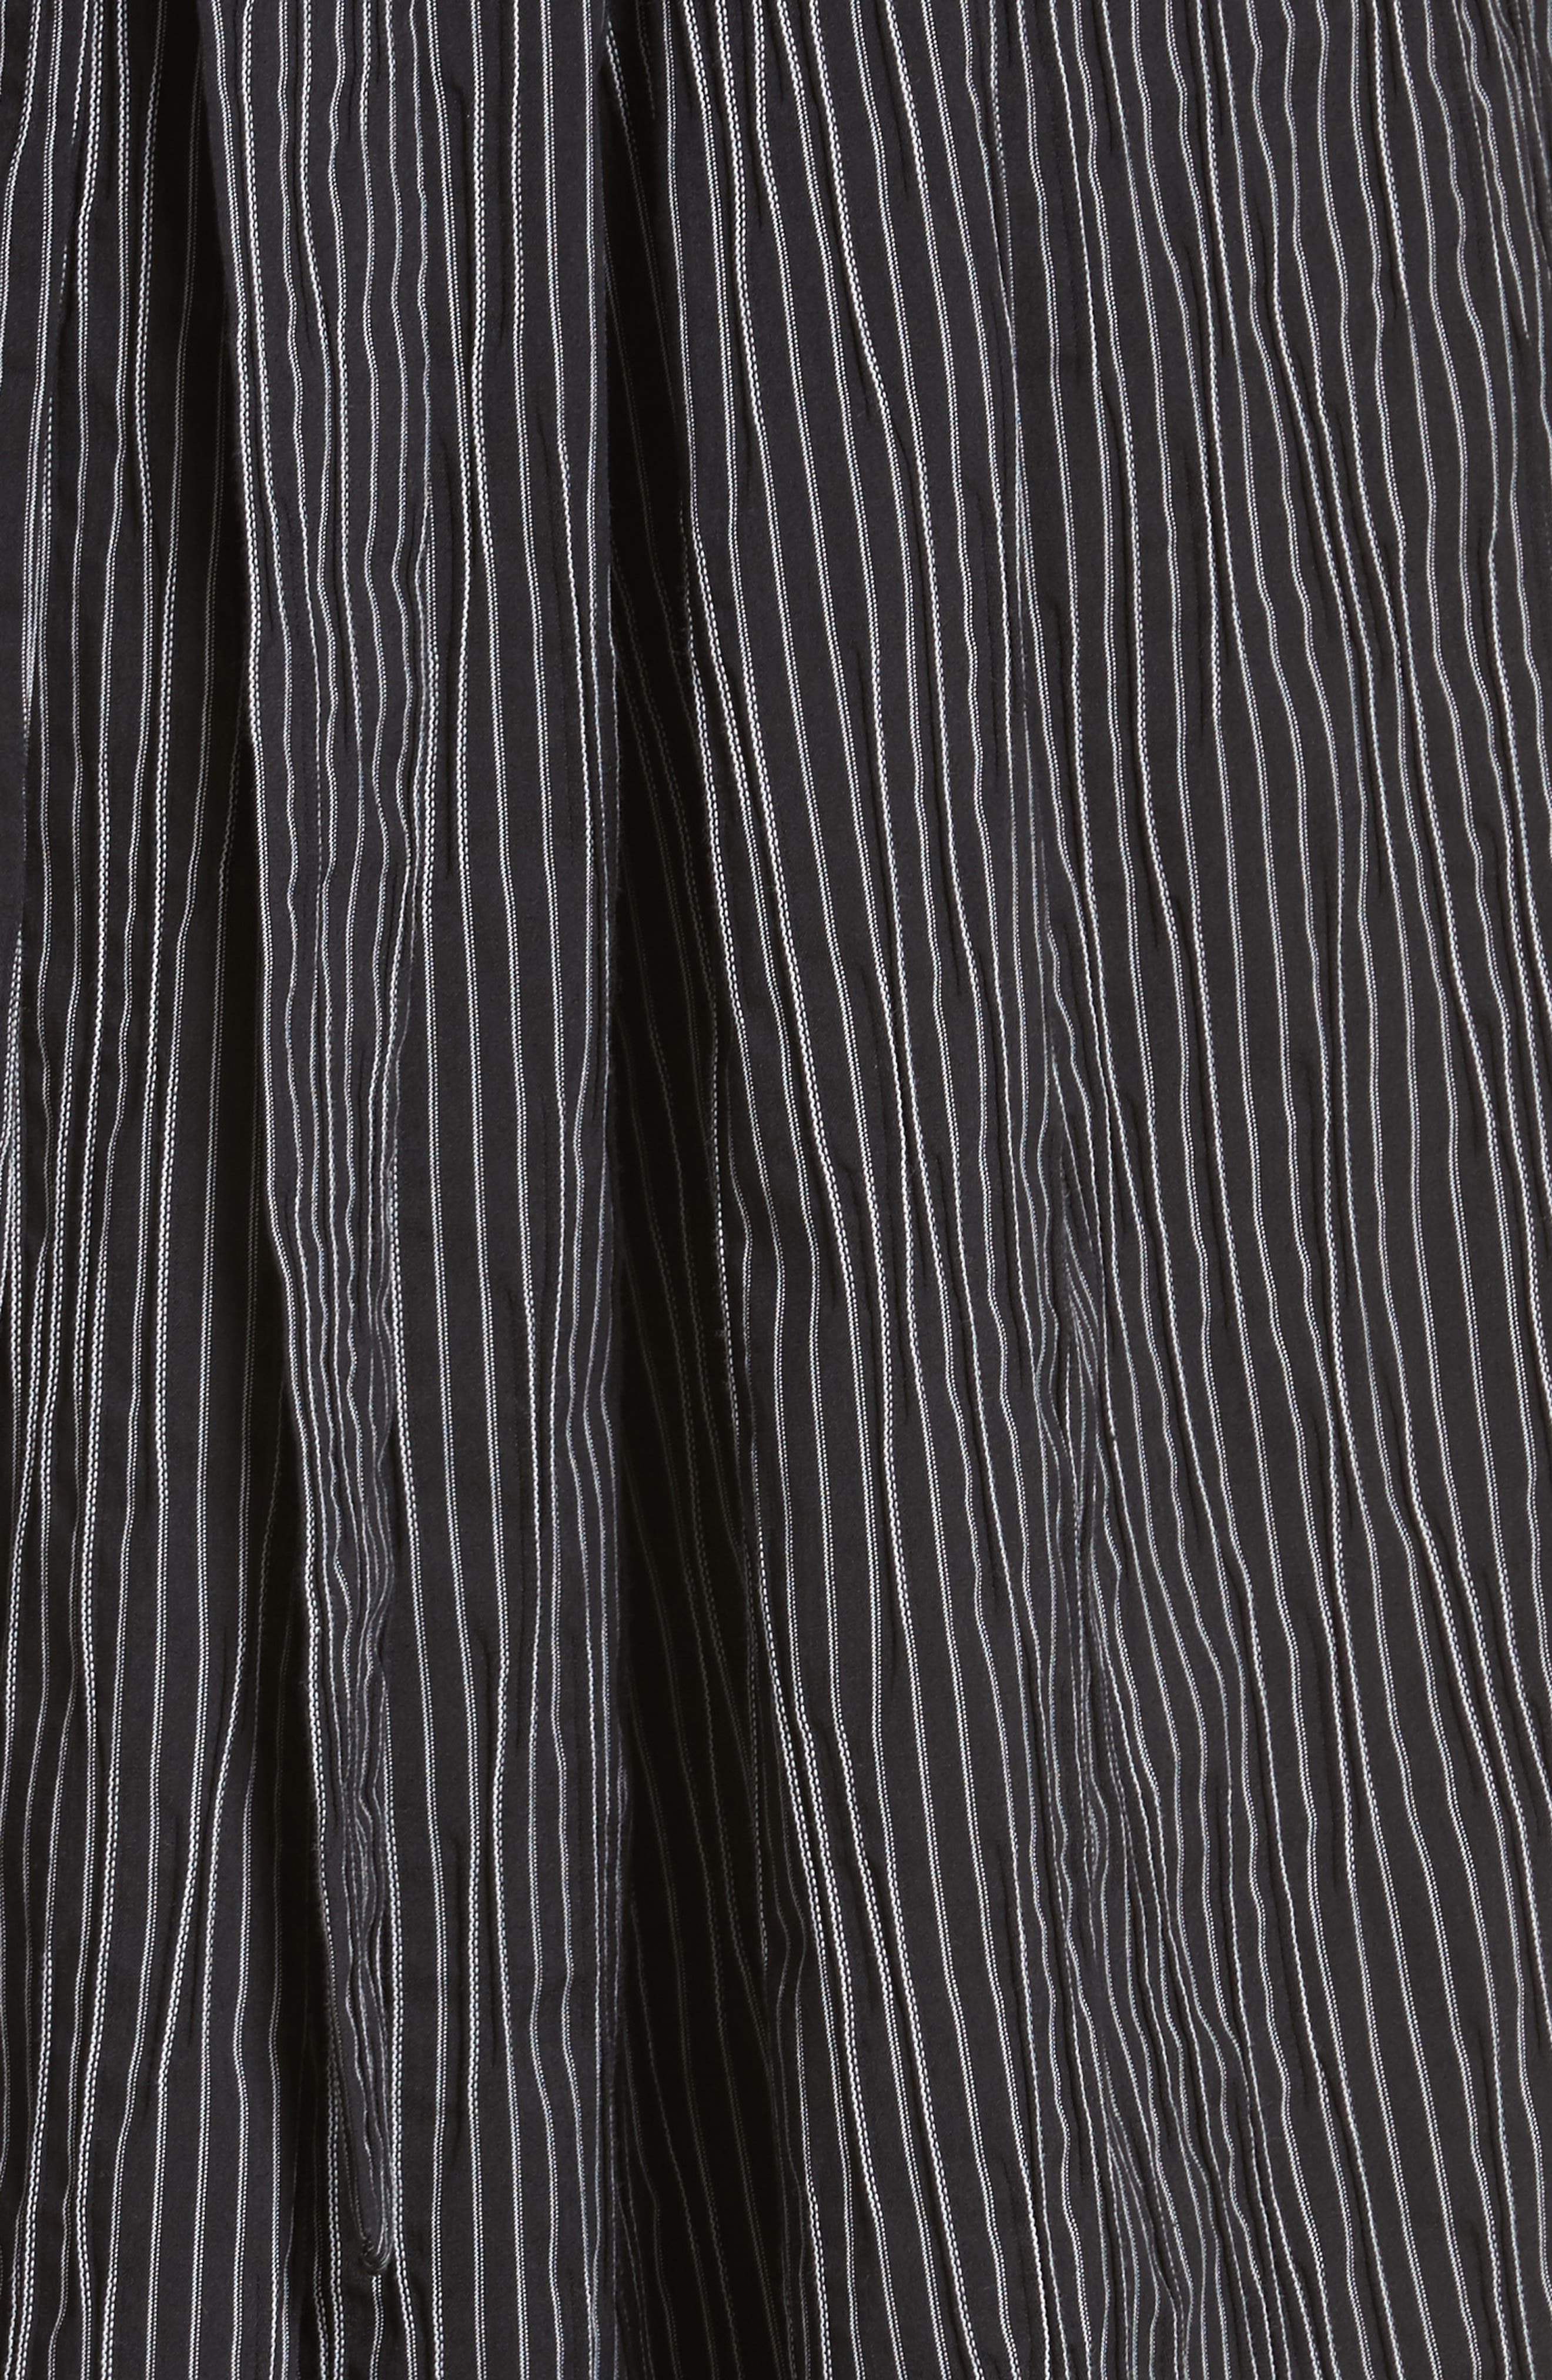 Stripe Crinkle Cotton Blend Midi Dress,                             Alternate thumbnail 5, color,                             010